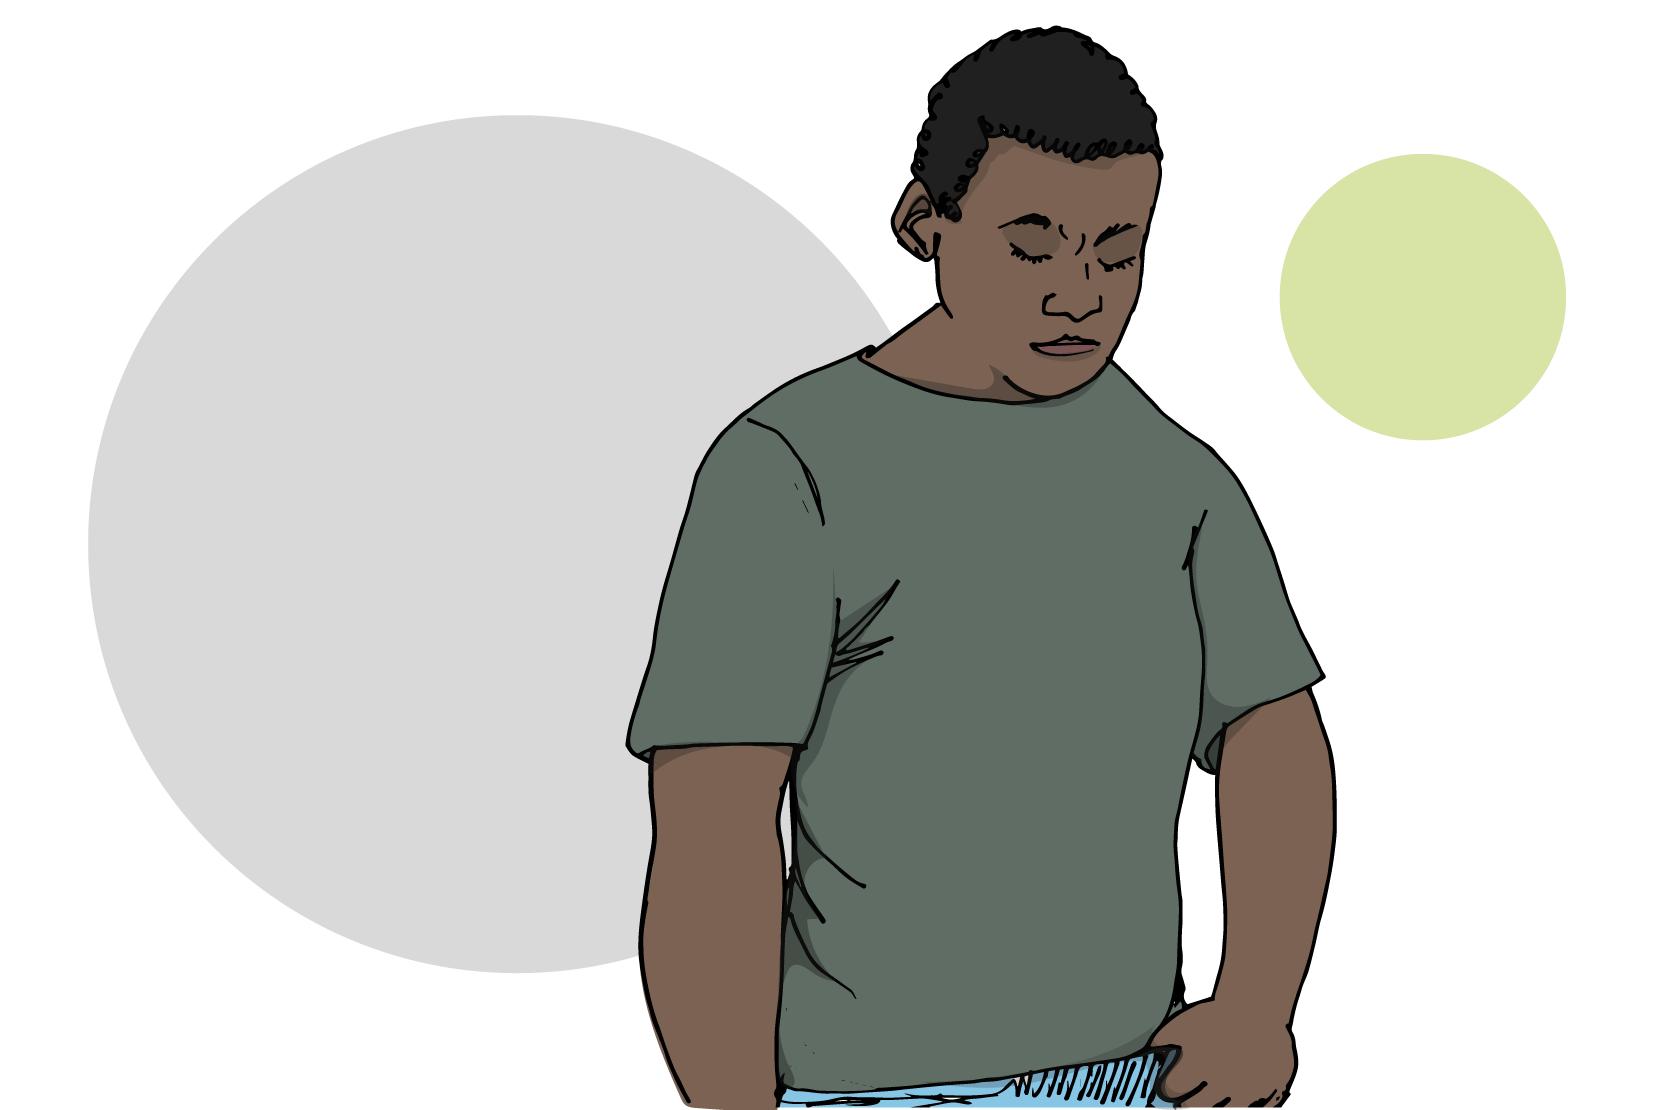 Jockiboi sexualkunskap